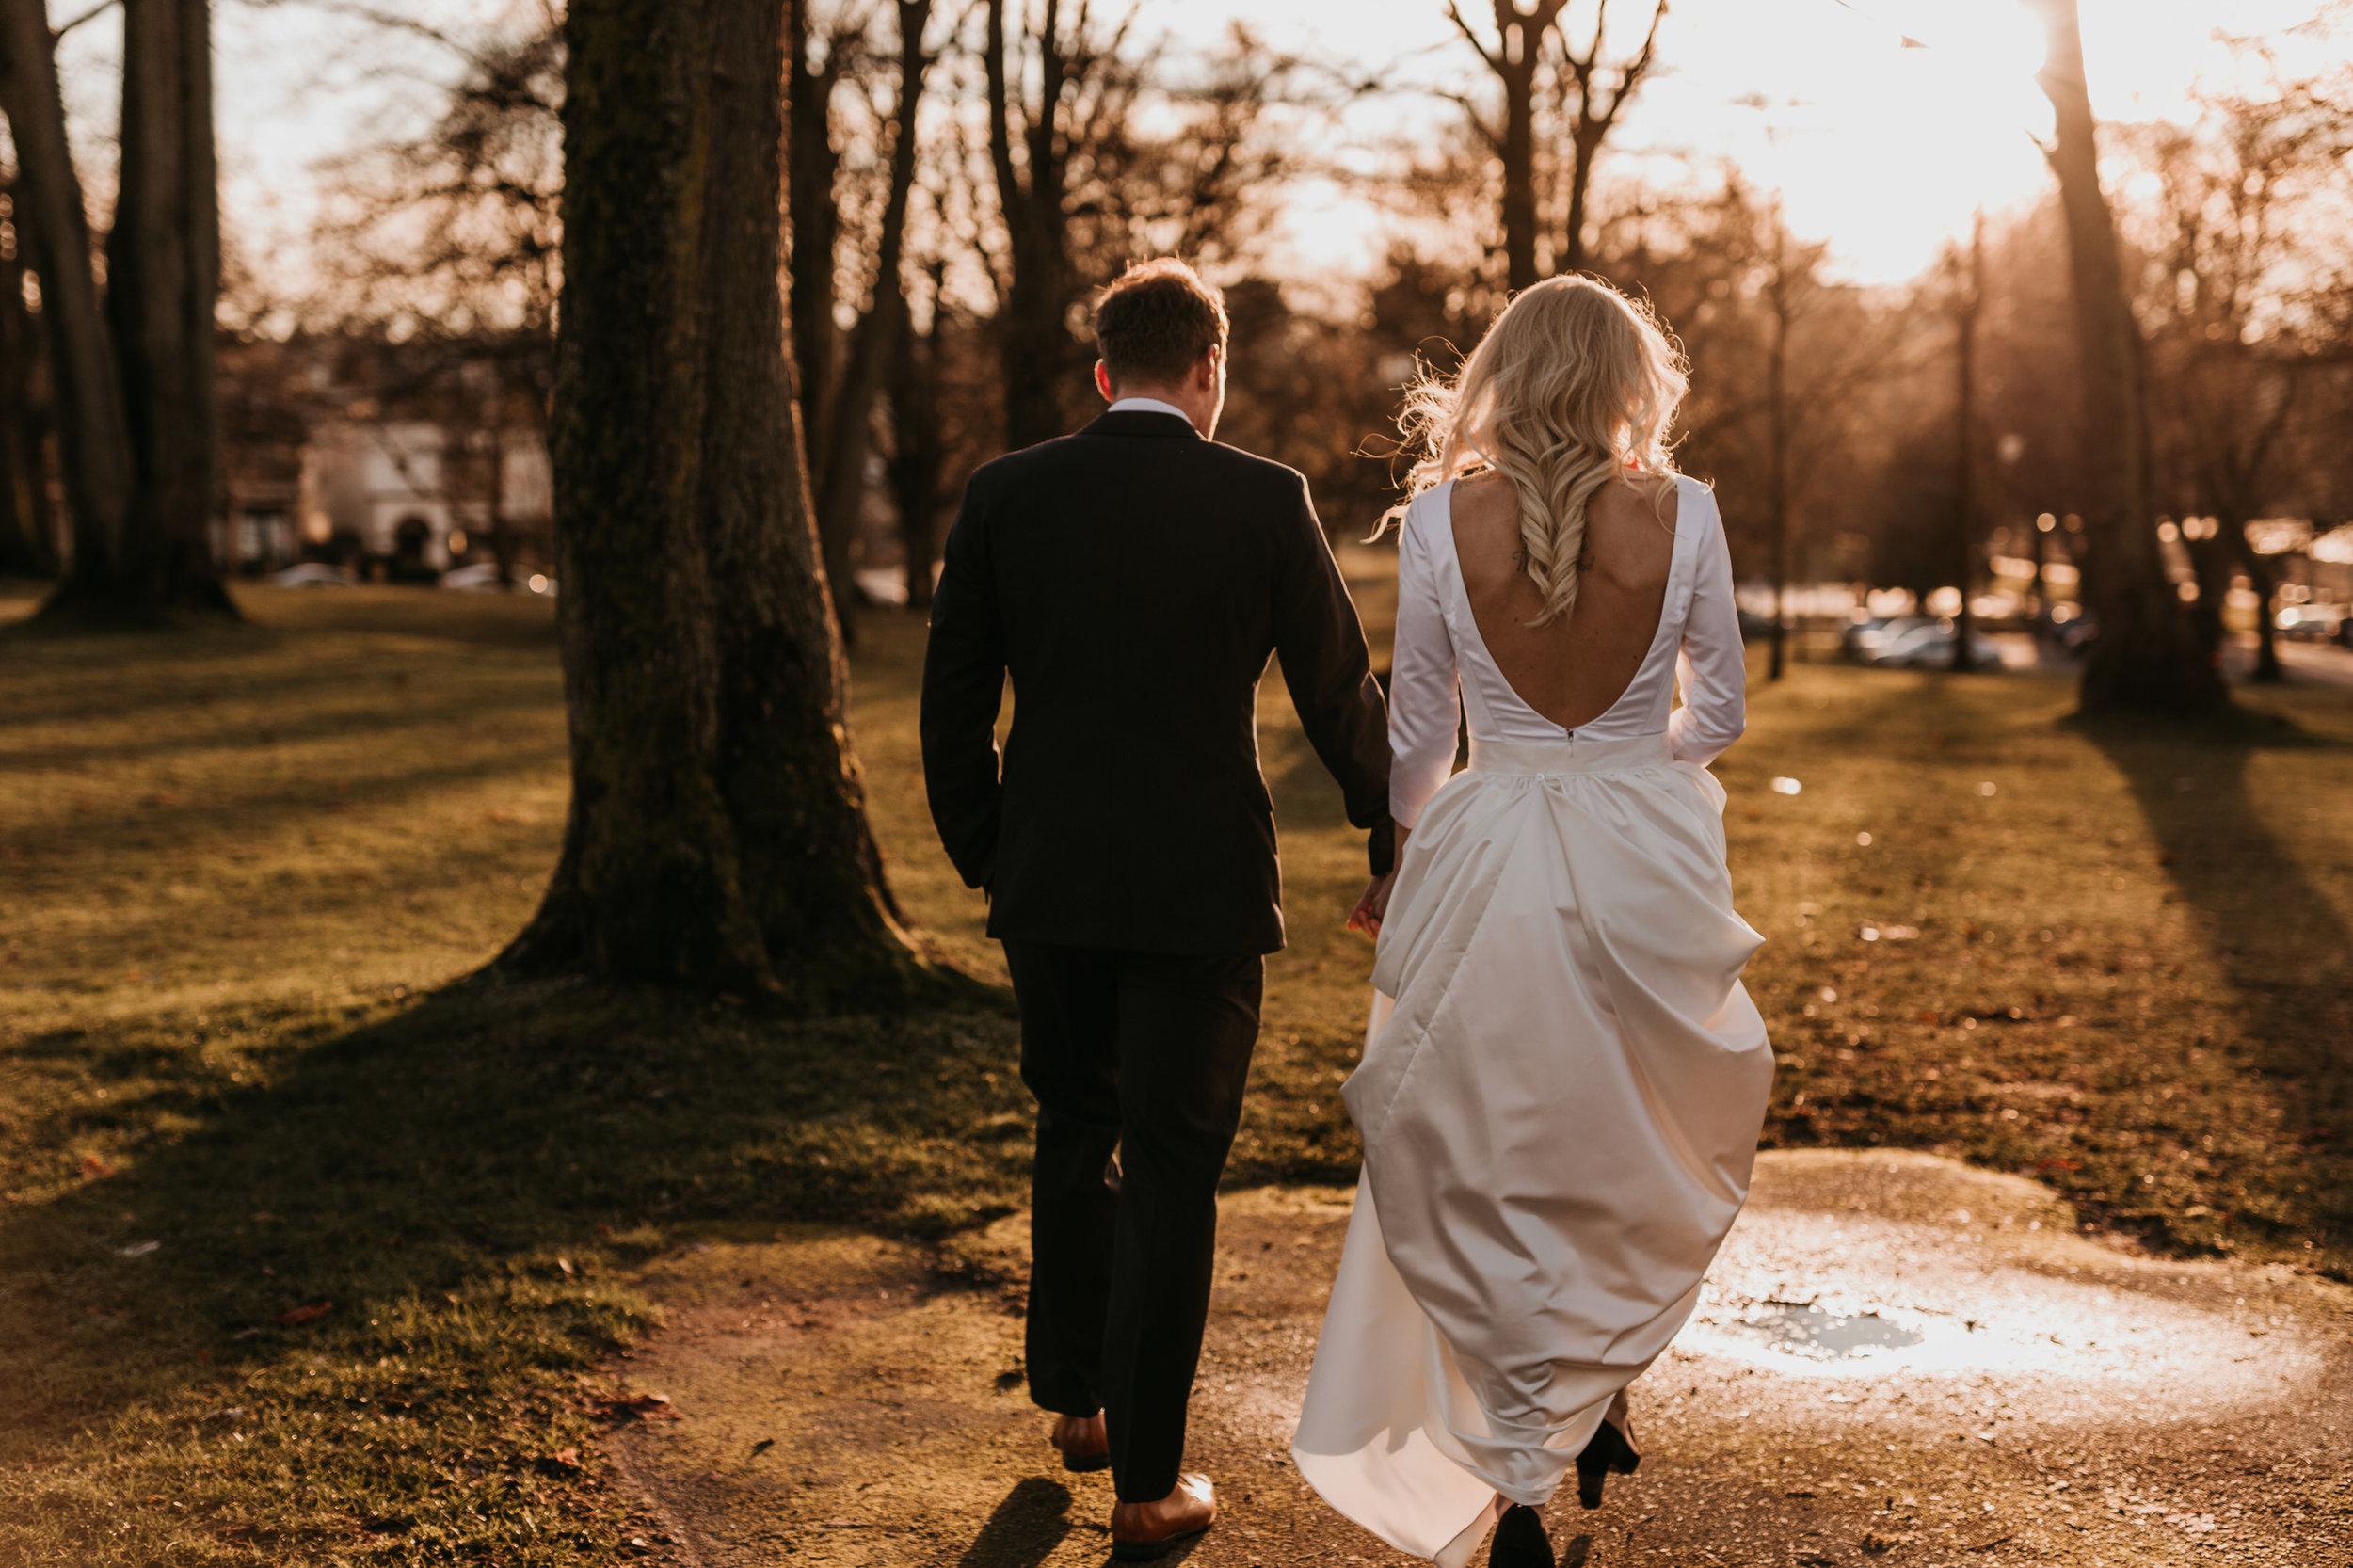 Vancouver Wedding Photos - Vegan Wedding Photographer - New Years Eve Wedding Photos - Vancouver Wedding Photographer - Vancouver Wedding Videographer - 720.JPG